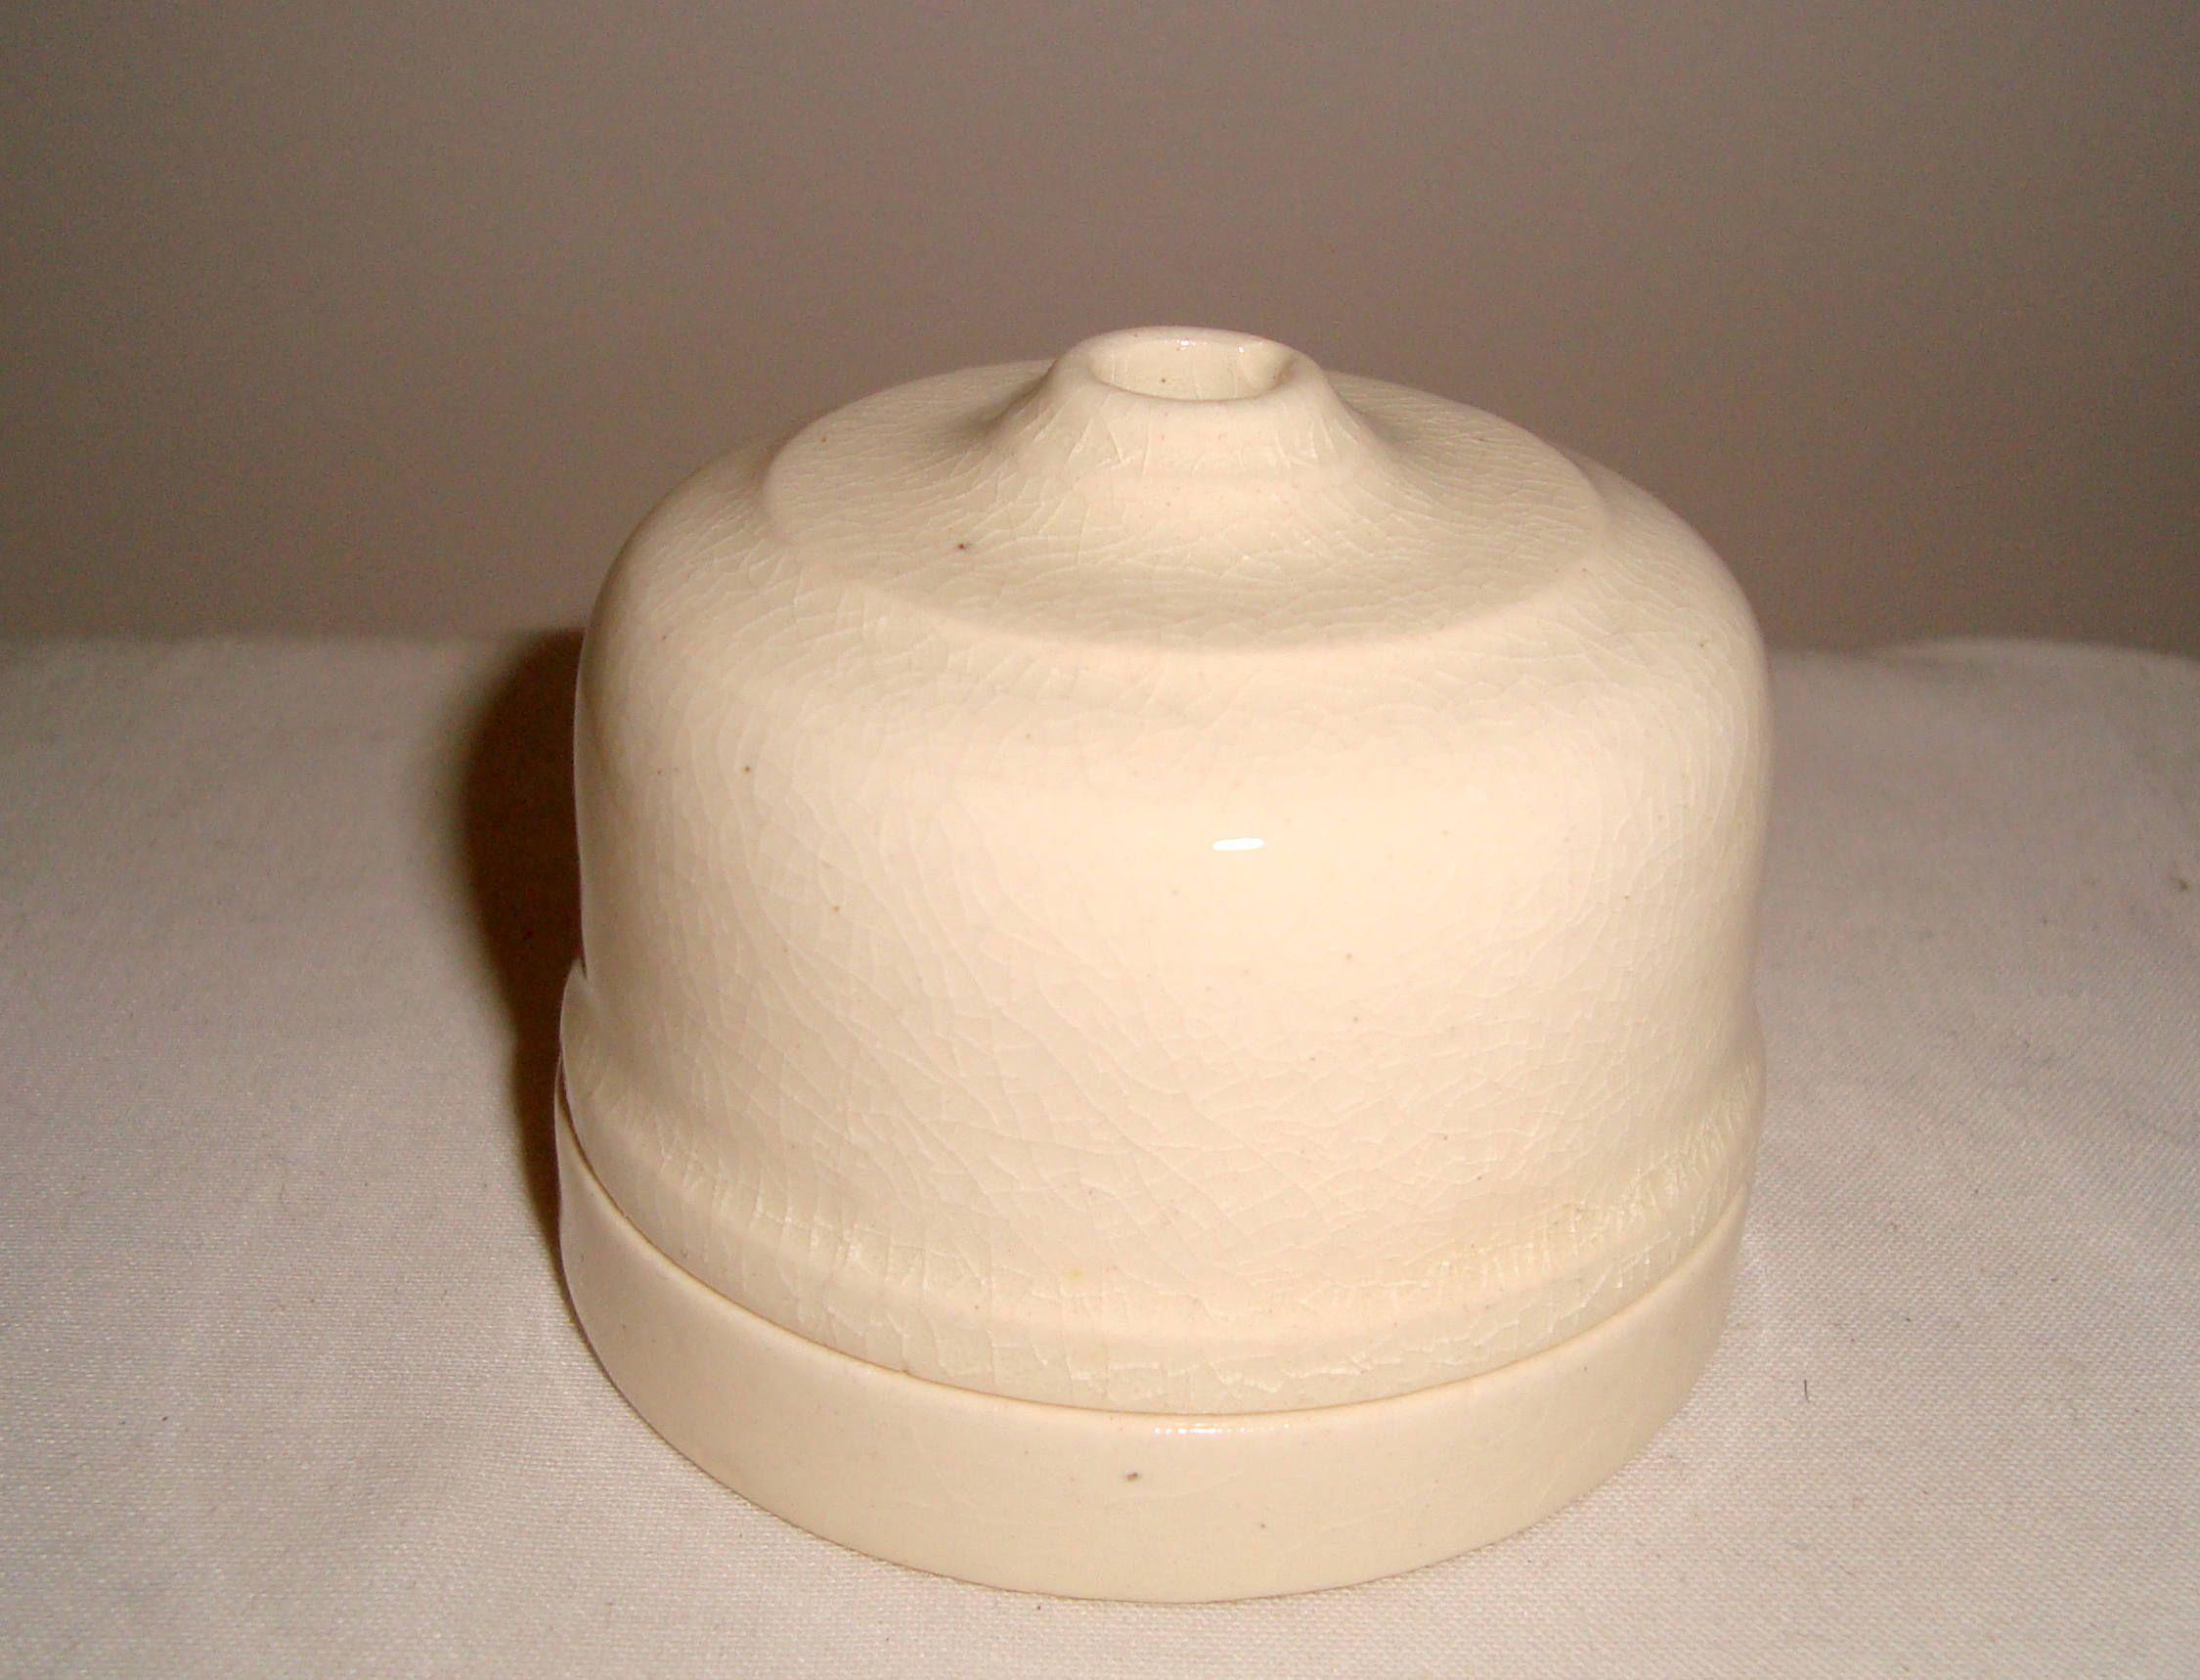 SALE! 1920s Ediswan White Porcelain British Ceiling Rose. Art Deco ...